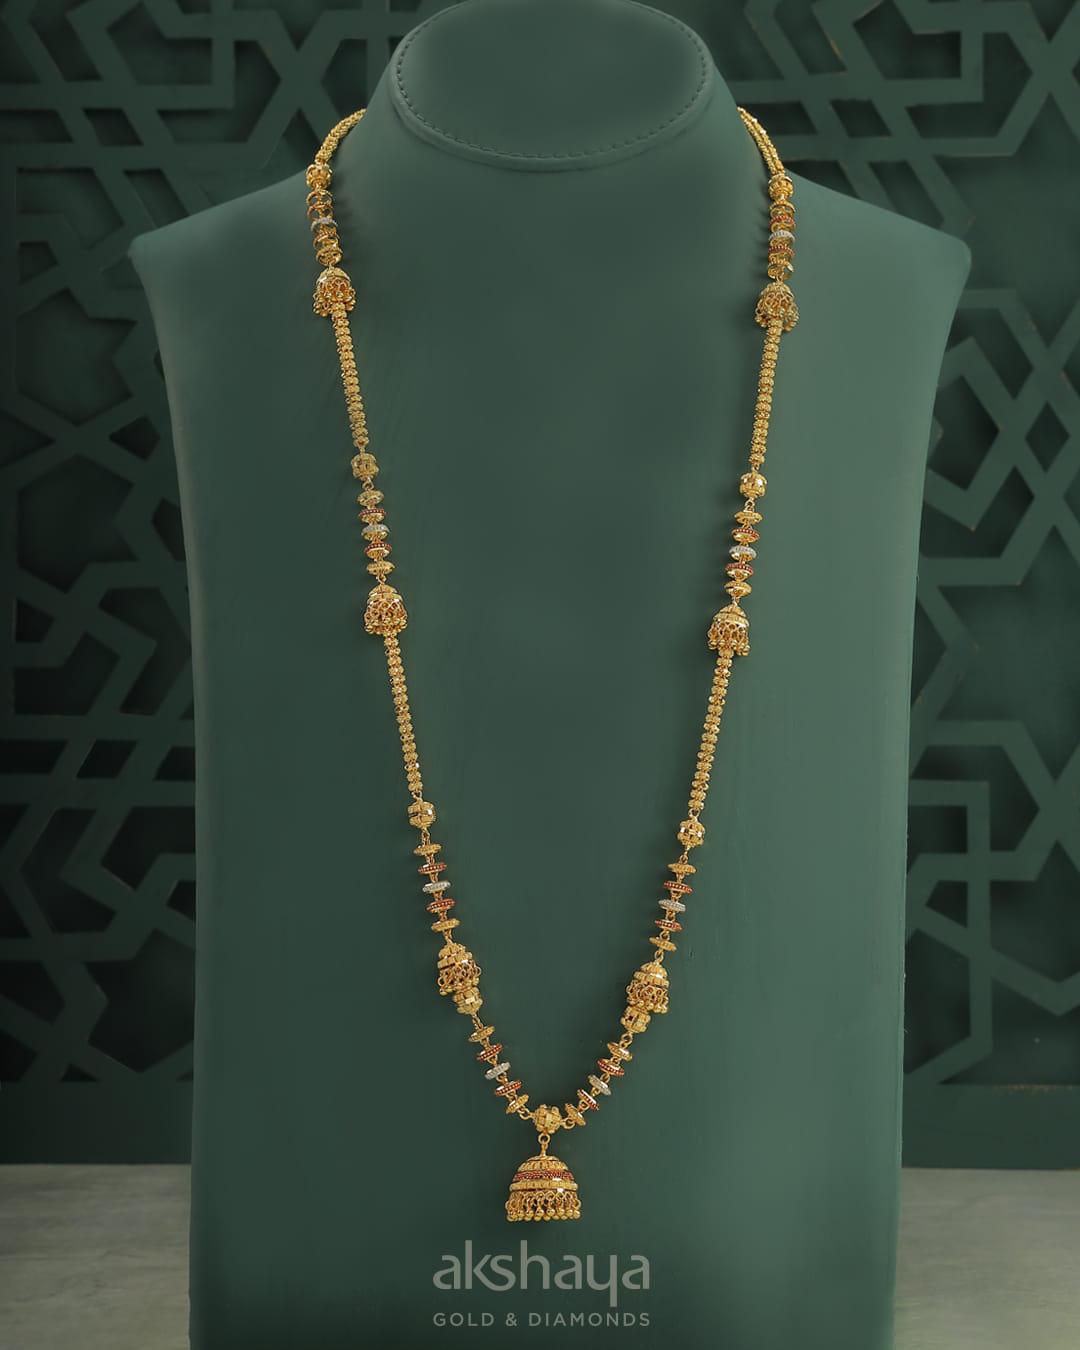 Akshaya Gold Necklace GL10248